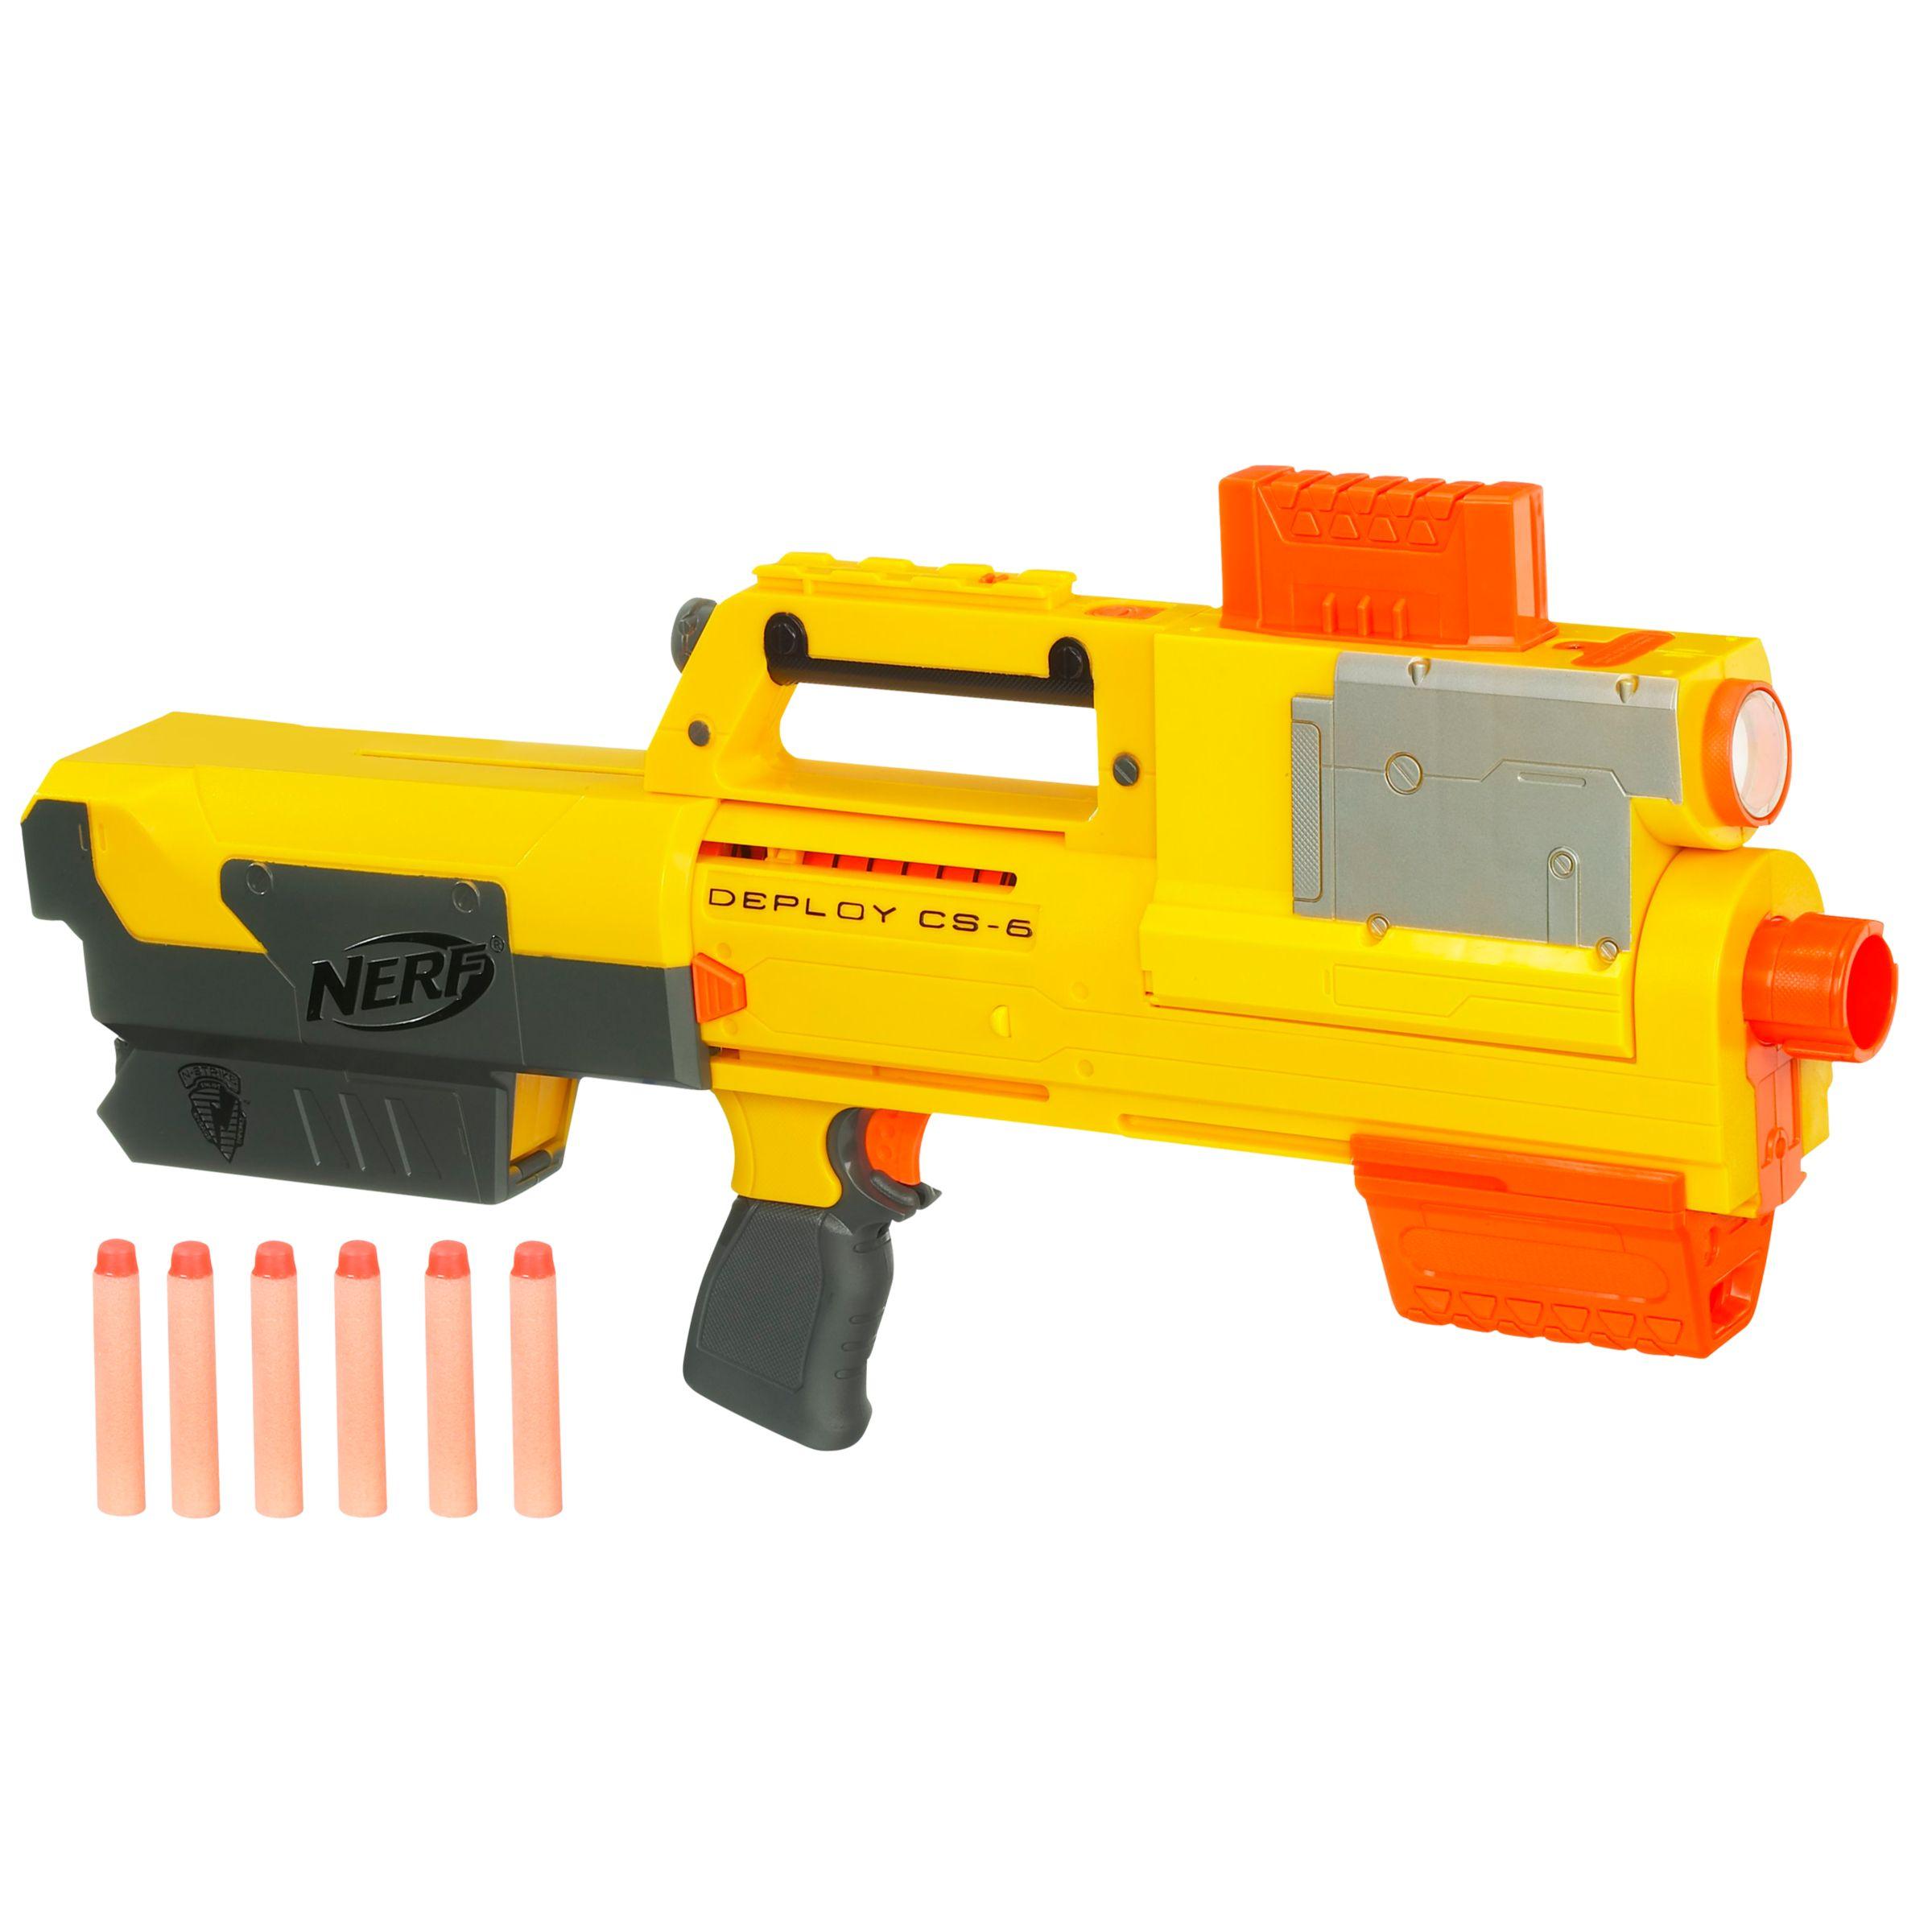 Hasbro Nerf N-Strike Deploy CS-6 Blaster